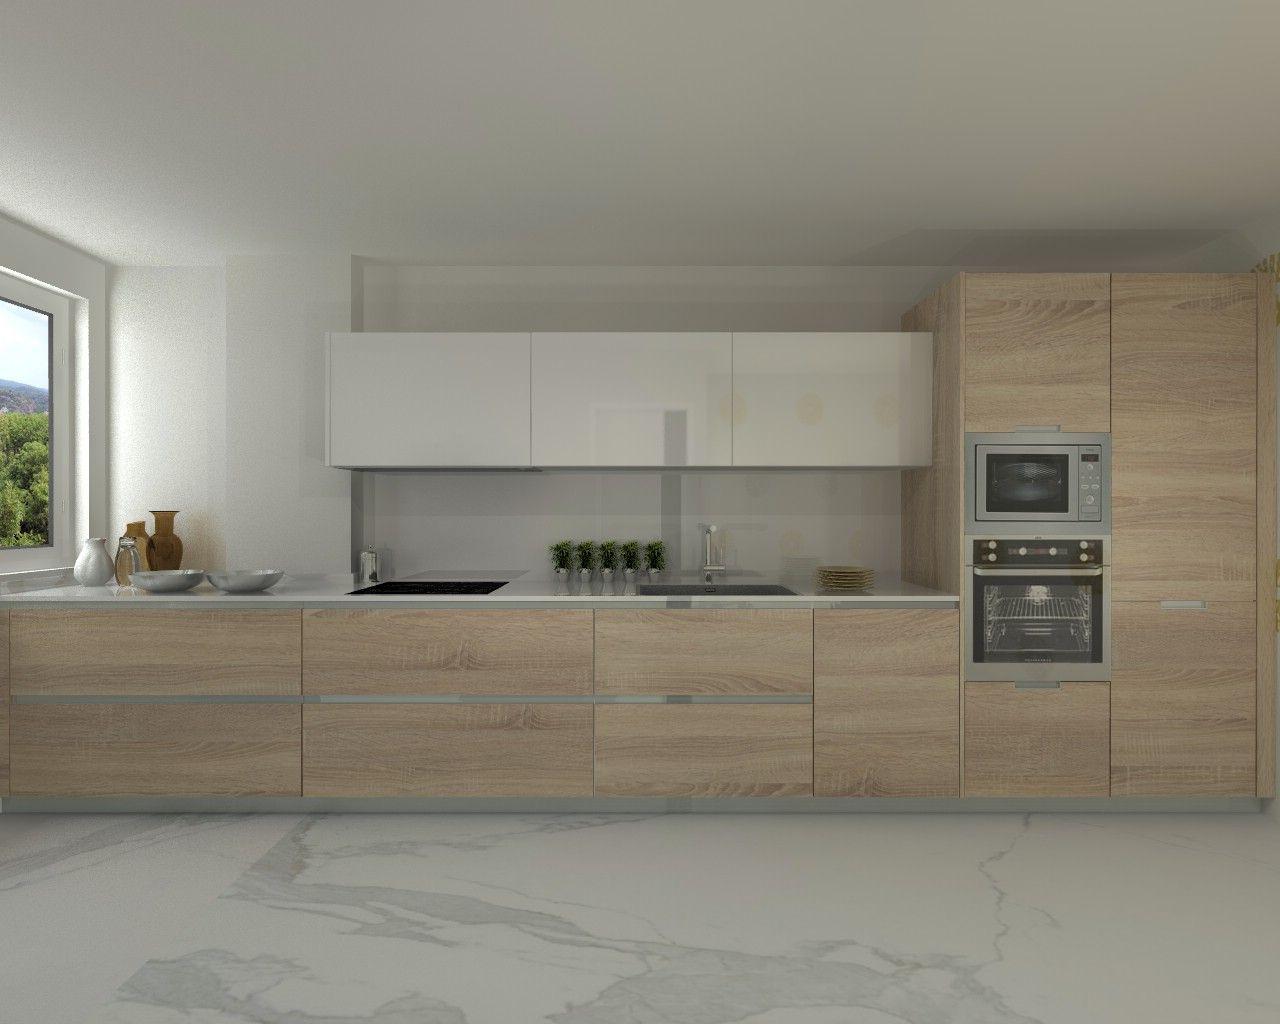 Modelo line e encimera silestone cocinas pinterest for Cocinas lineales de cuatro metros